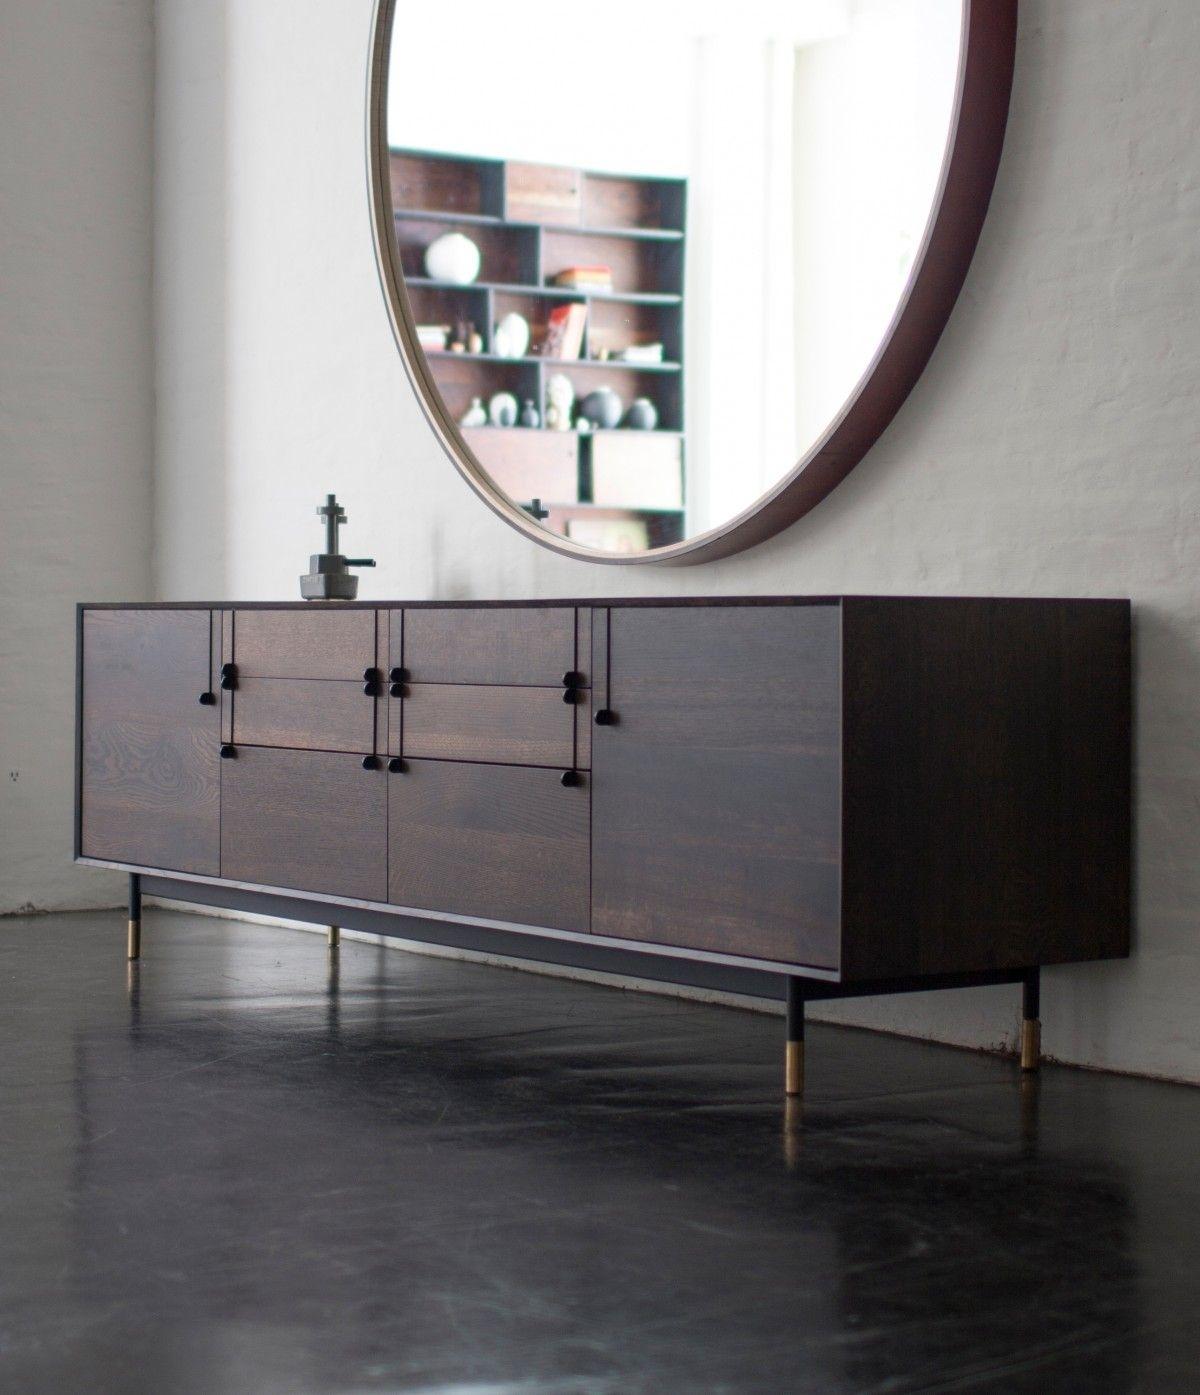 Furniture | Lake Credenza | Bddw | Sideboard | Pinterest | Furniture Throughout Most Recent Rani 4 Door Sideboards (#4 of 20)